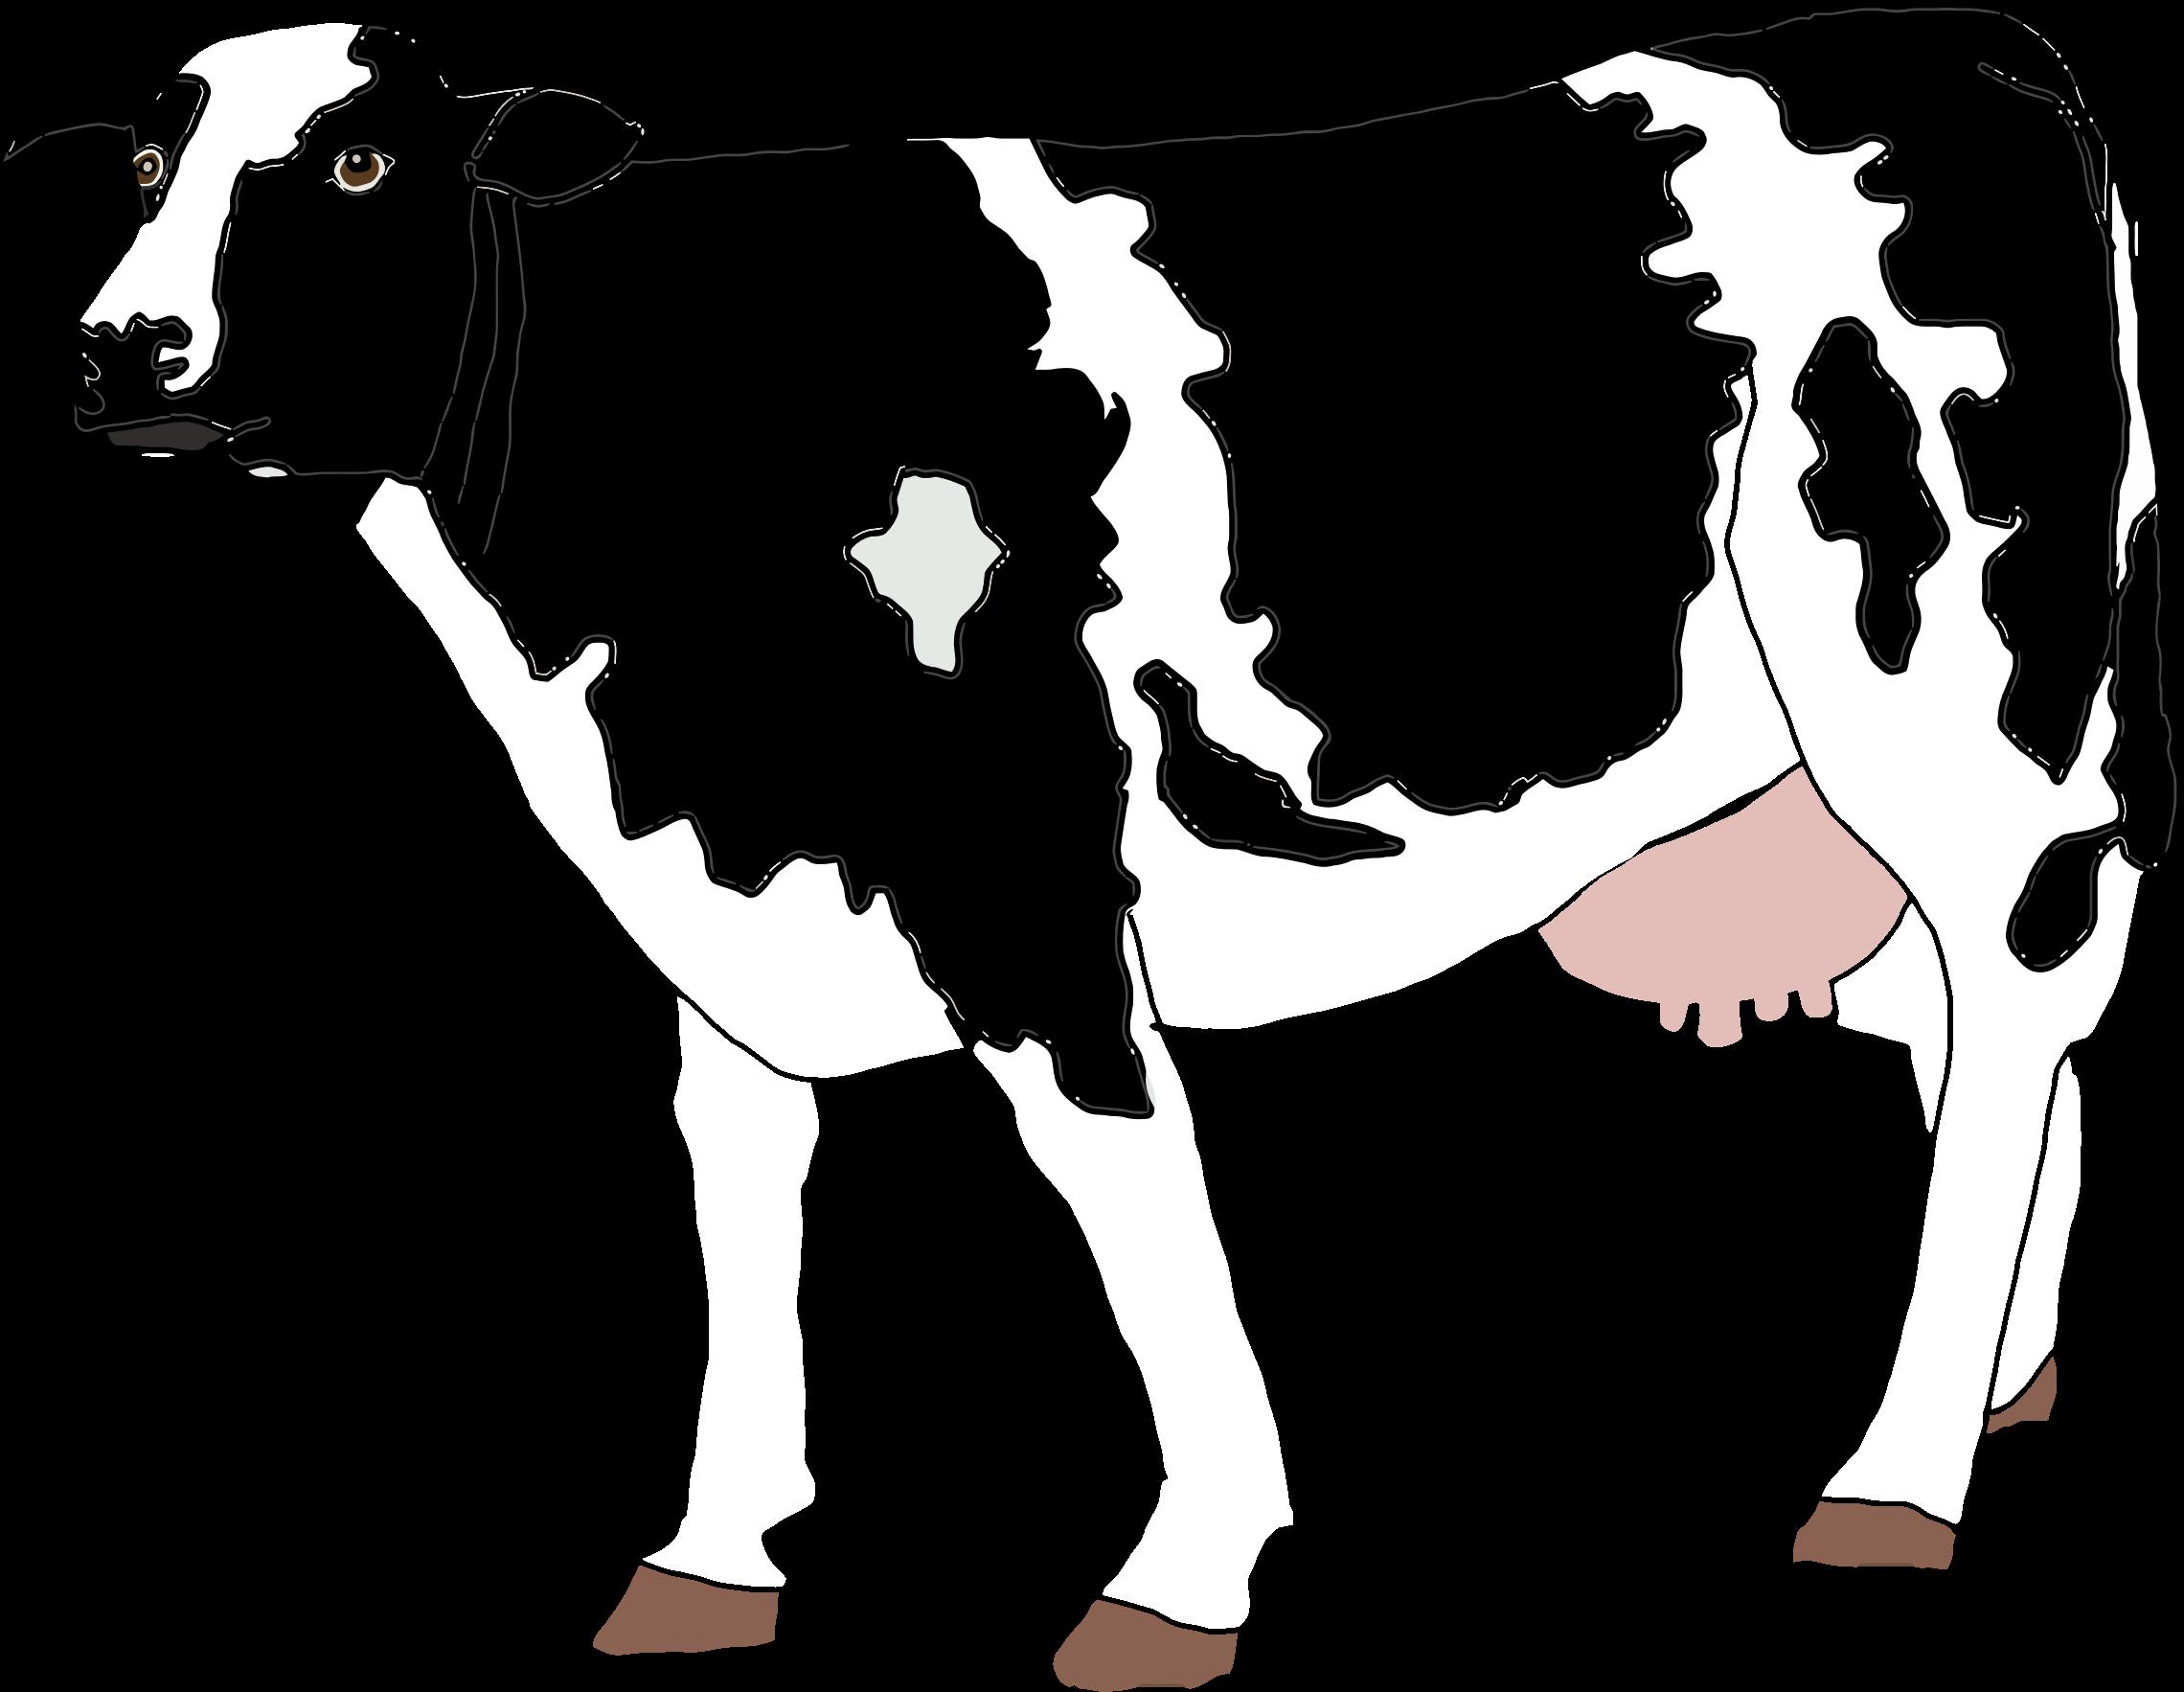 Goat clipart realistic. Cow illustration big image